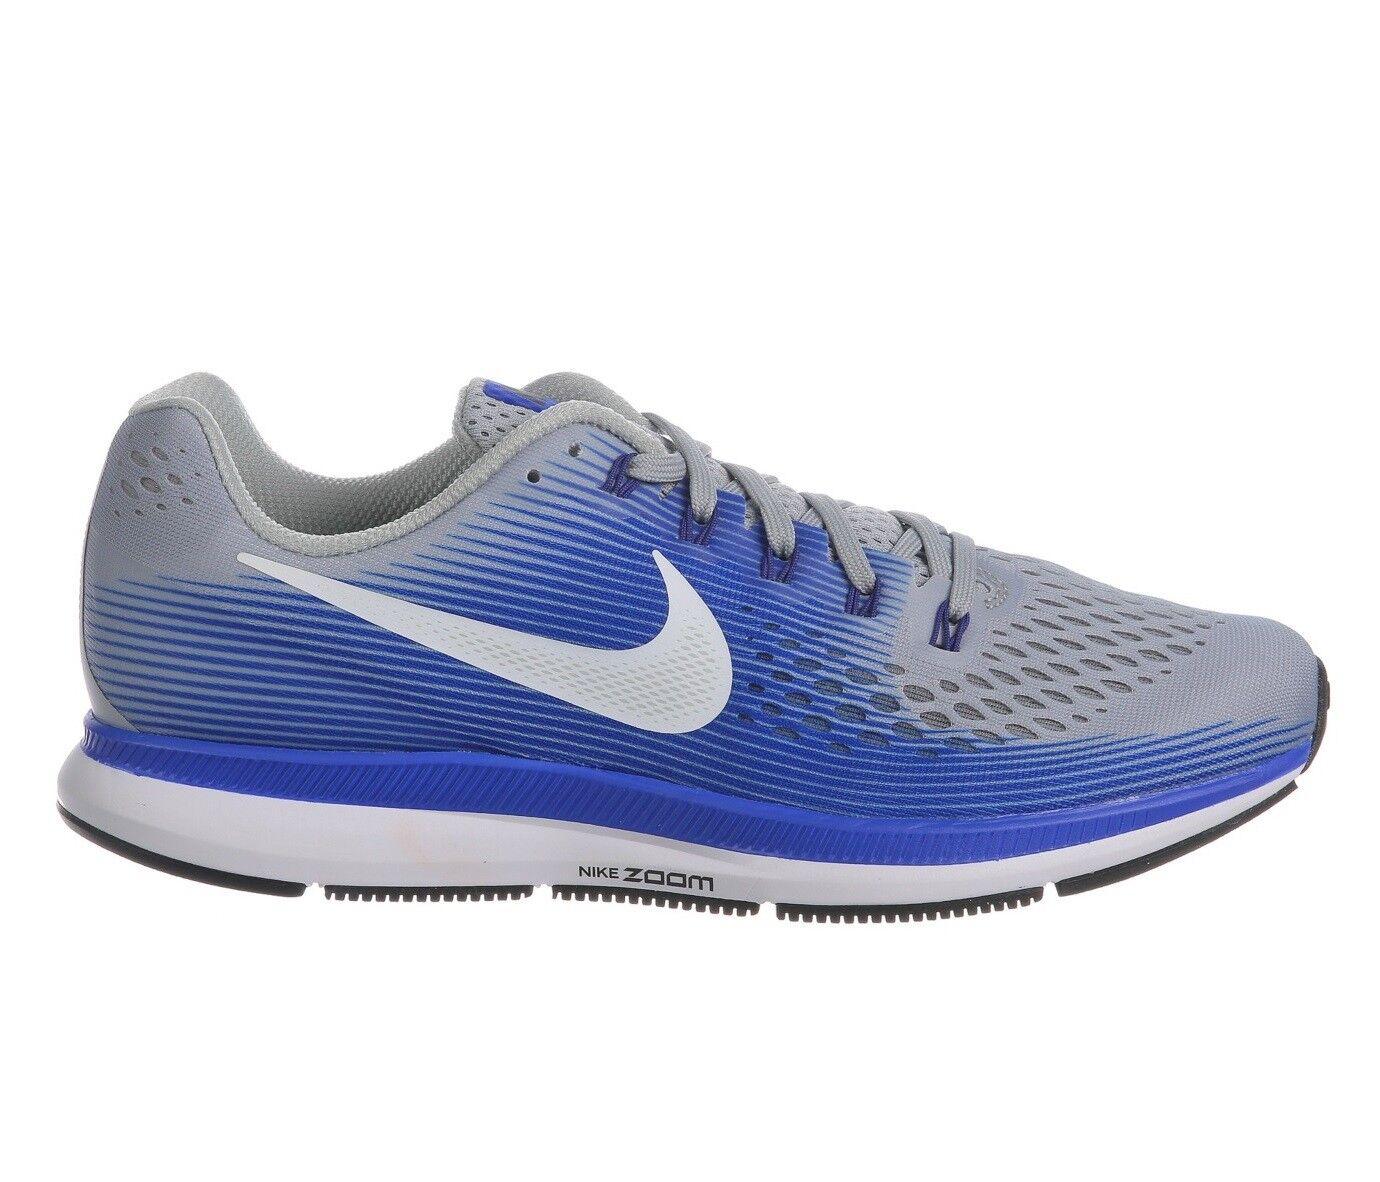 Nike air zoom pegasus 880555-007 34 uomini 880555-007 pegasus grigio blu scarpe taglia 6,5 racer b2993b